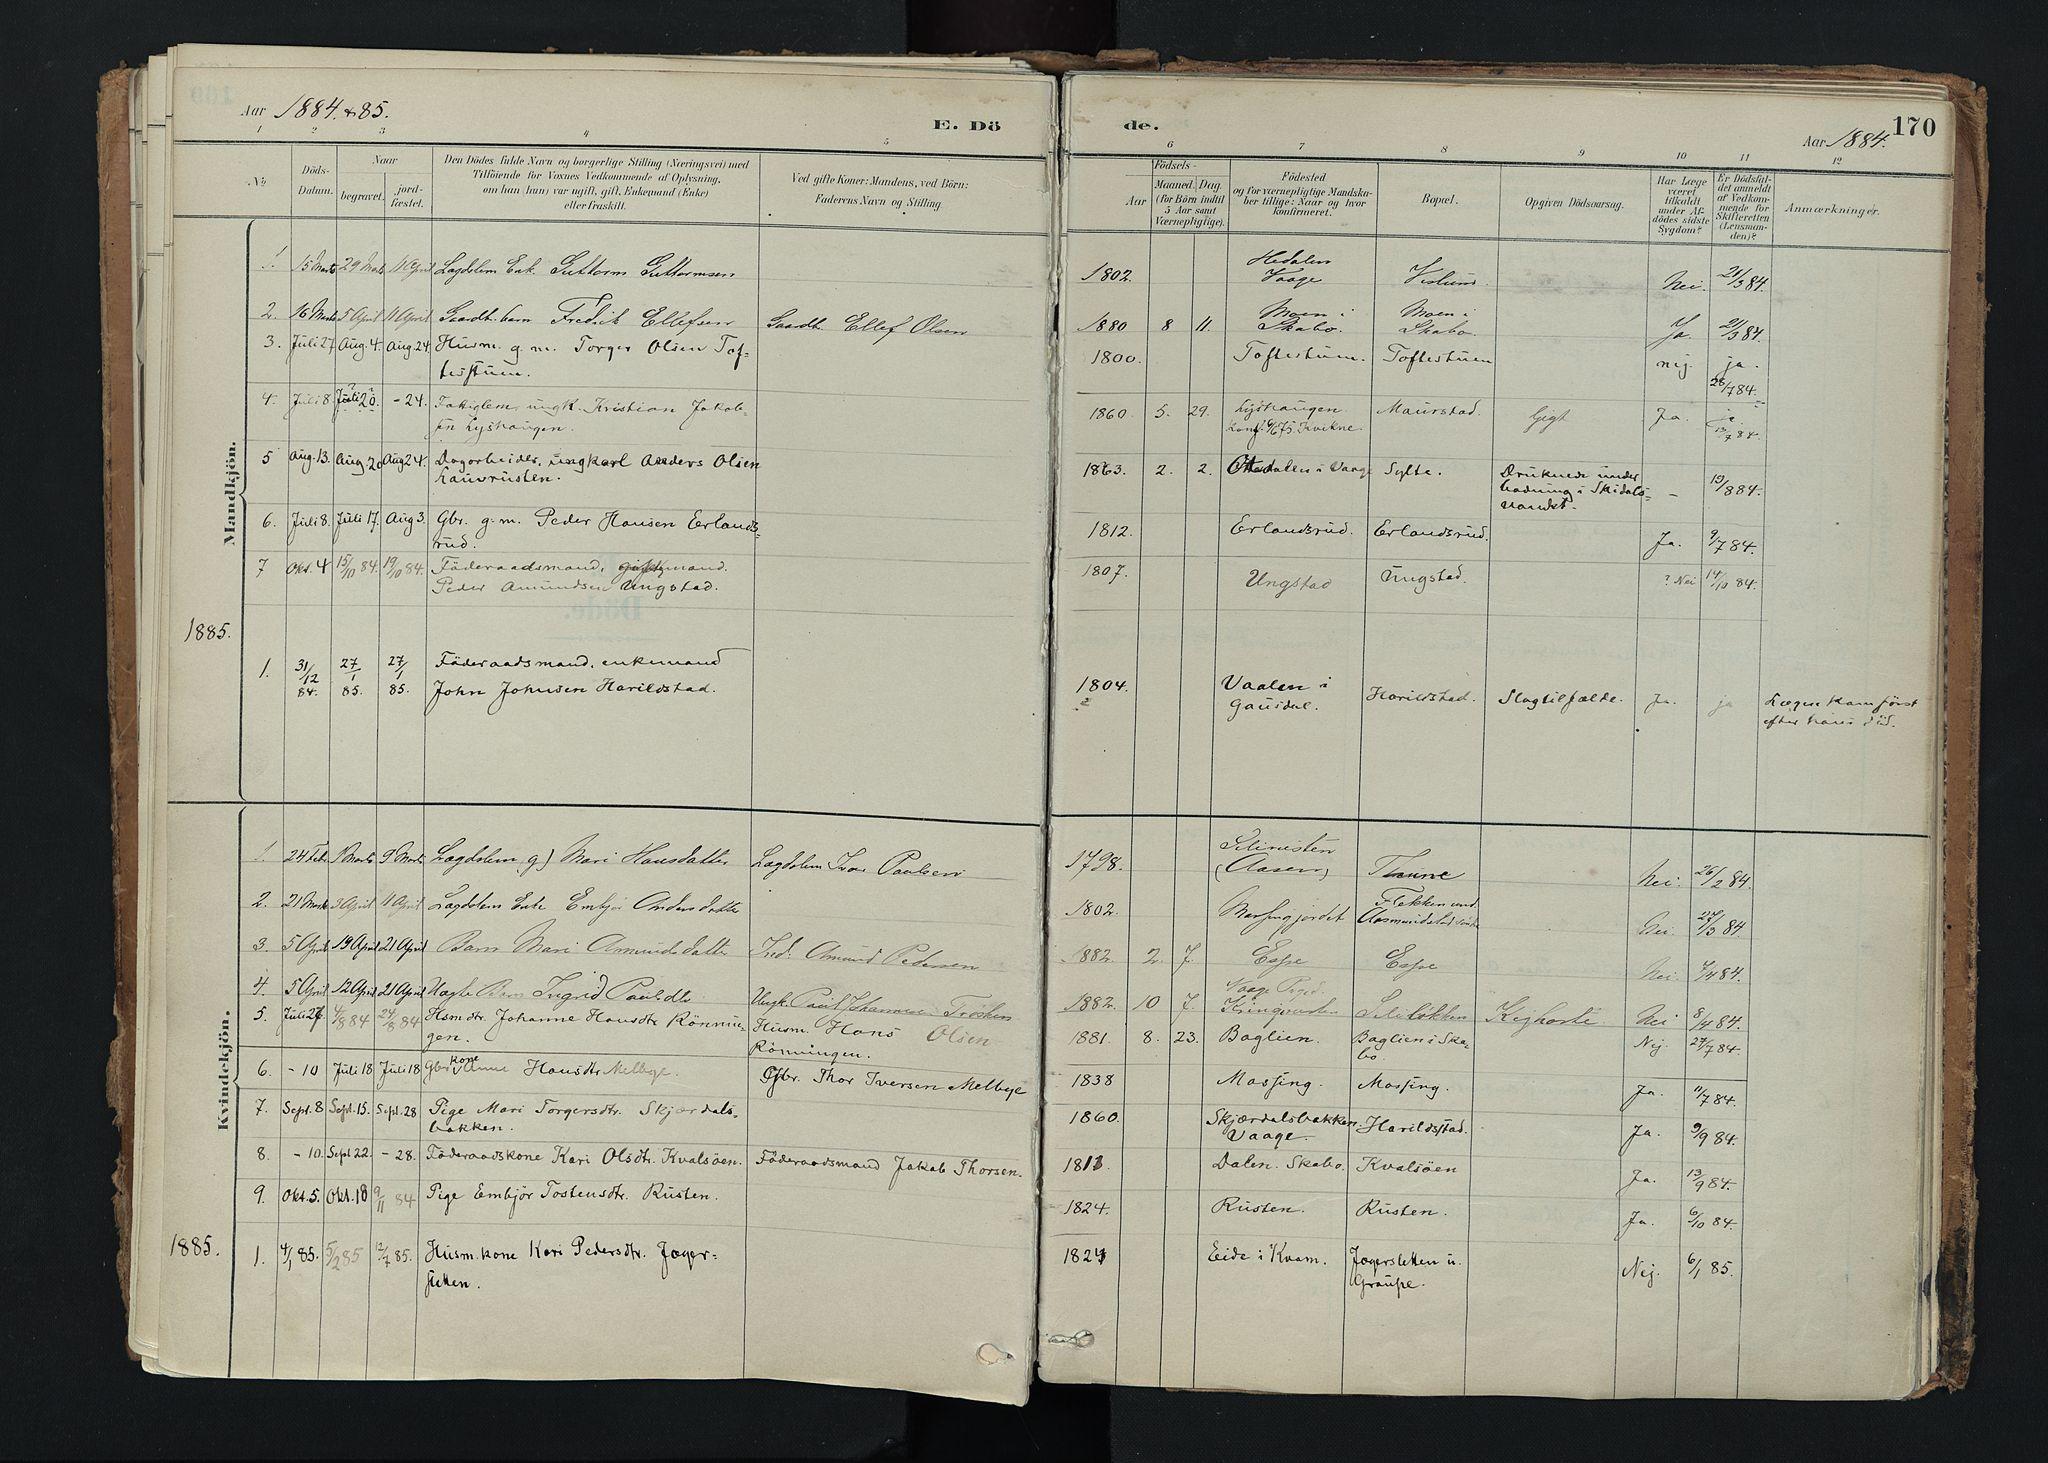 SAH, Nord-Fron prestekontor, Ministerialbok nr. 5, 1884-1914, s. 170